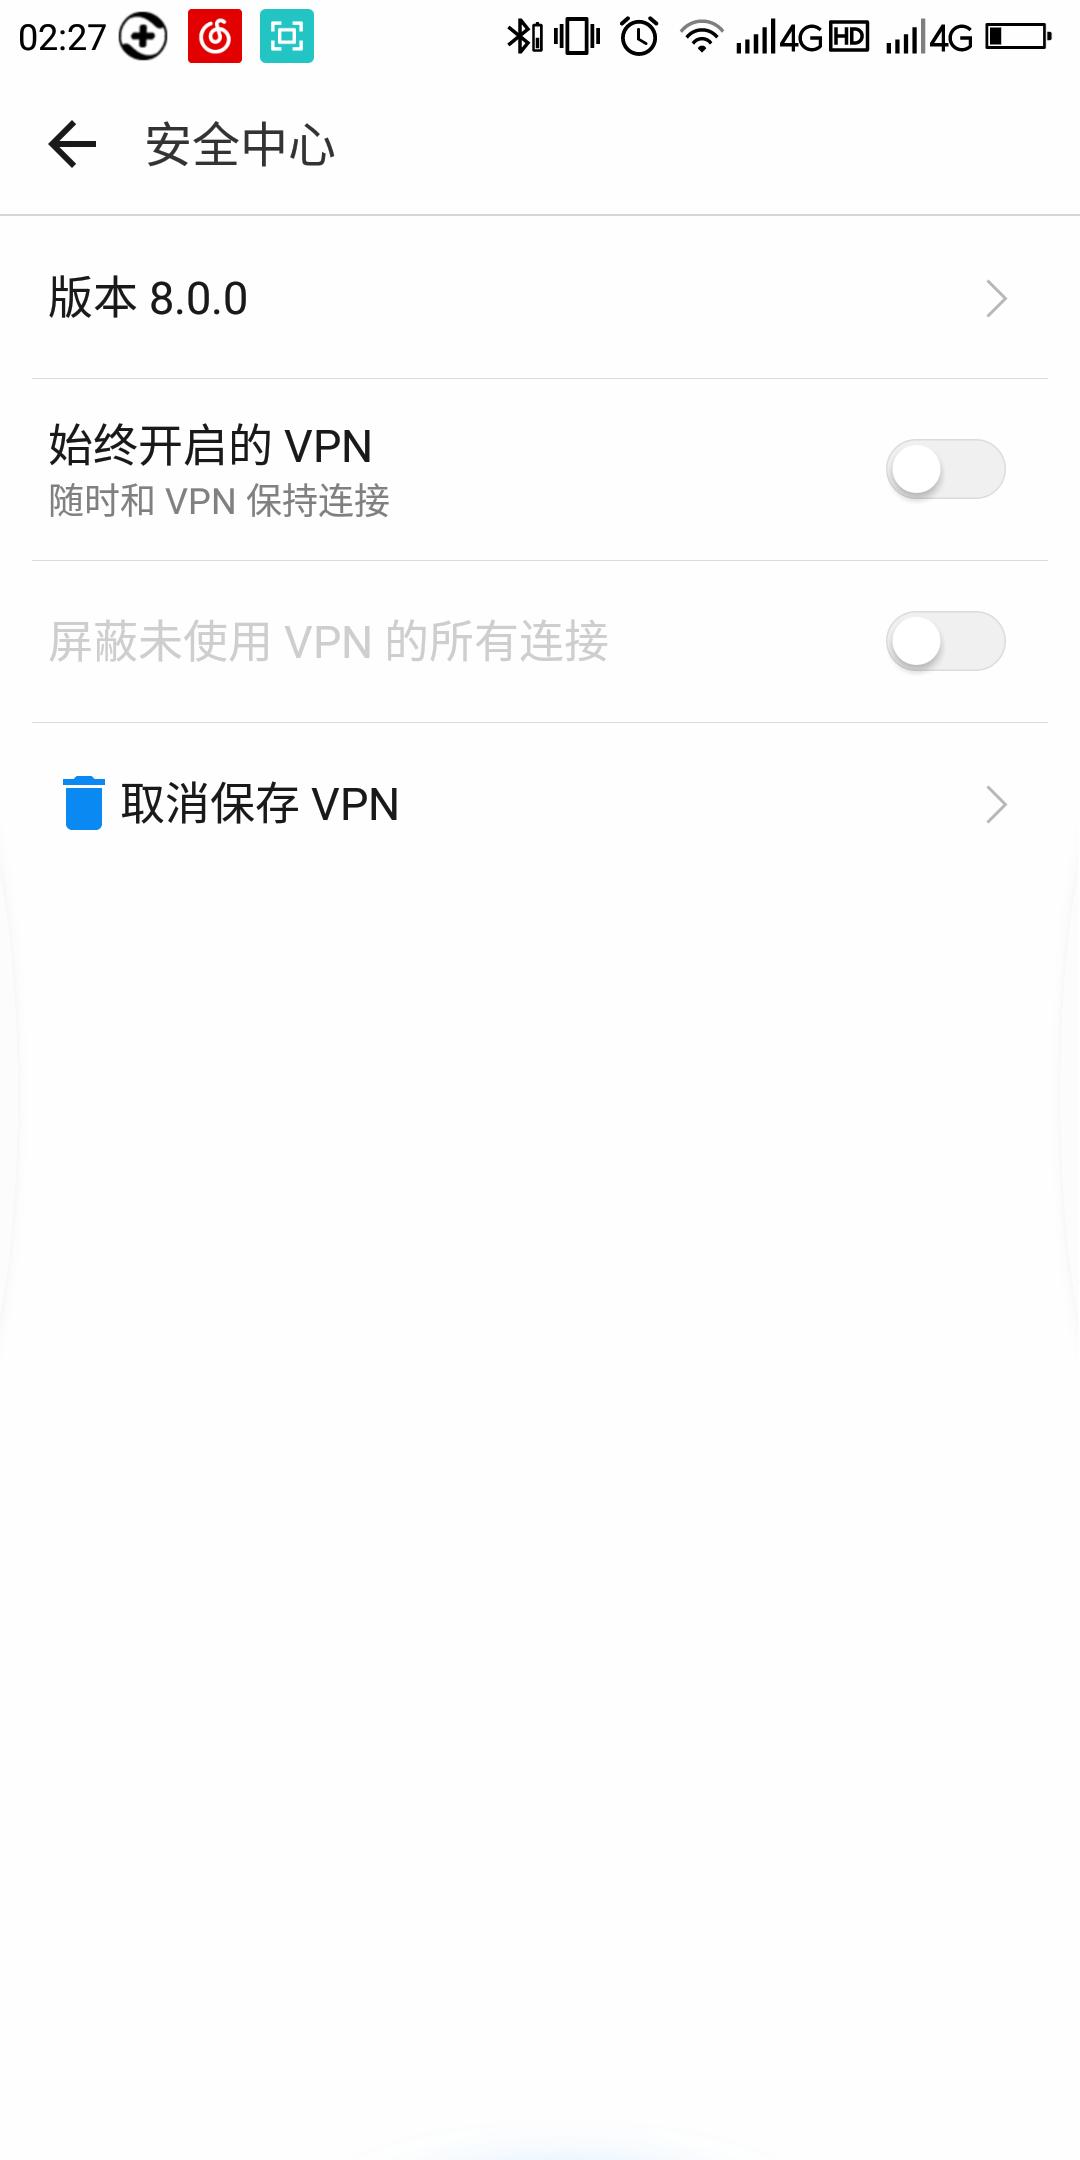 Screenshot_2019-01-28-02-27-32.png